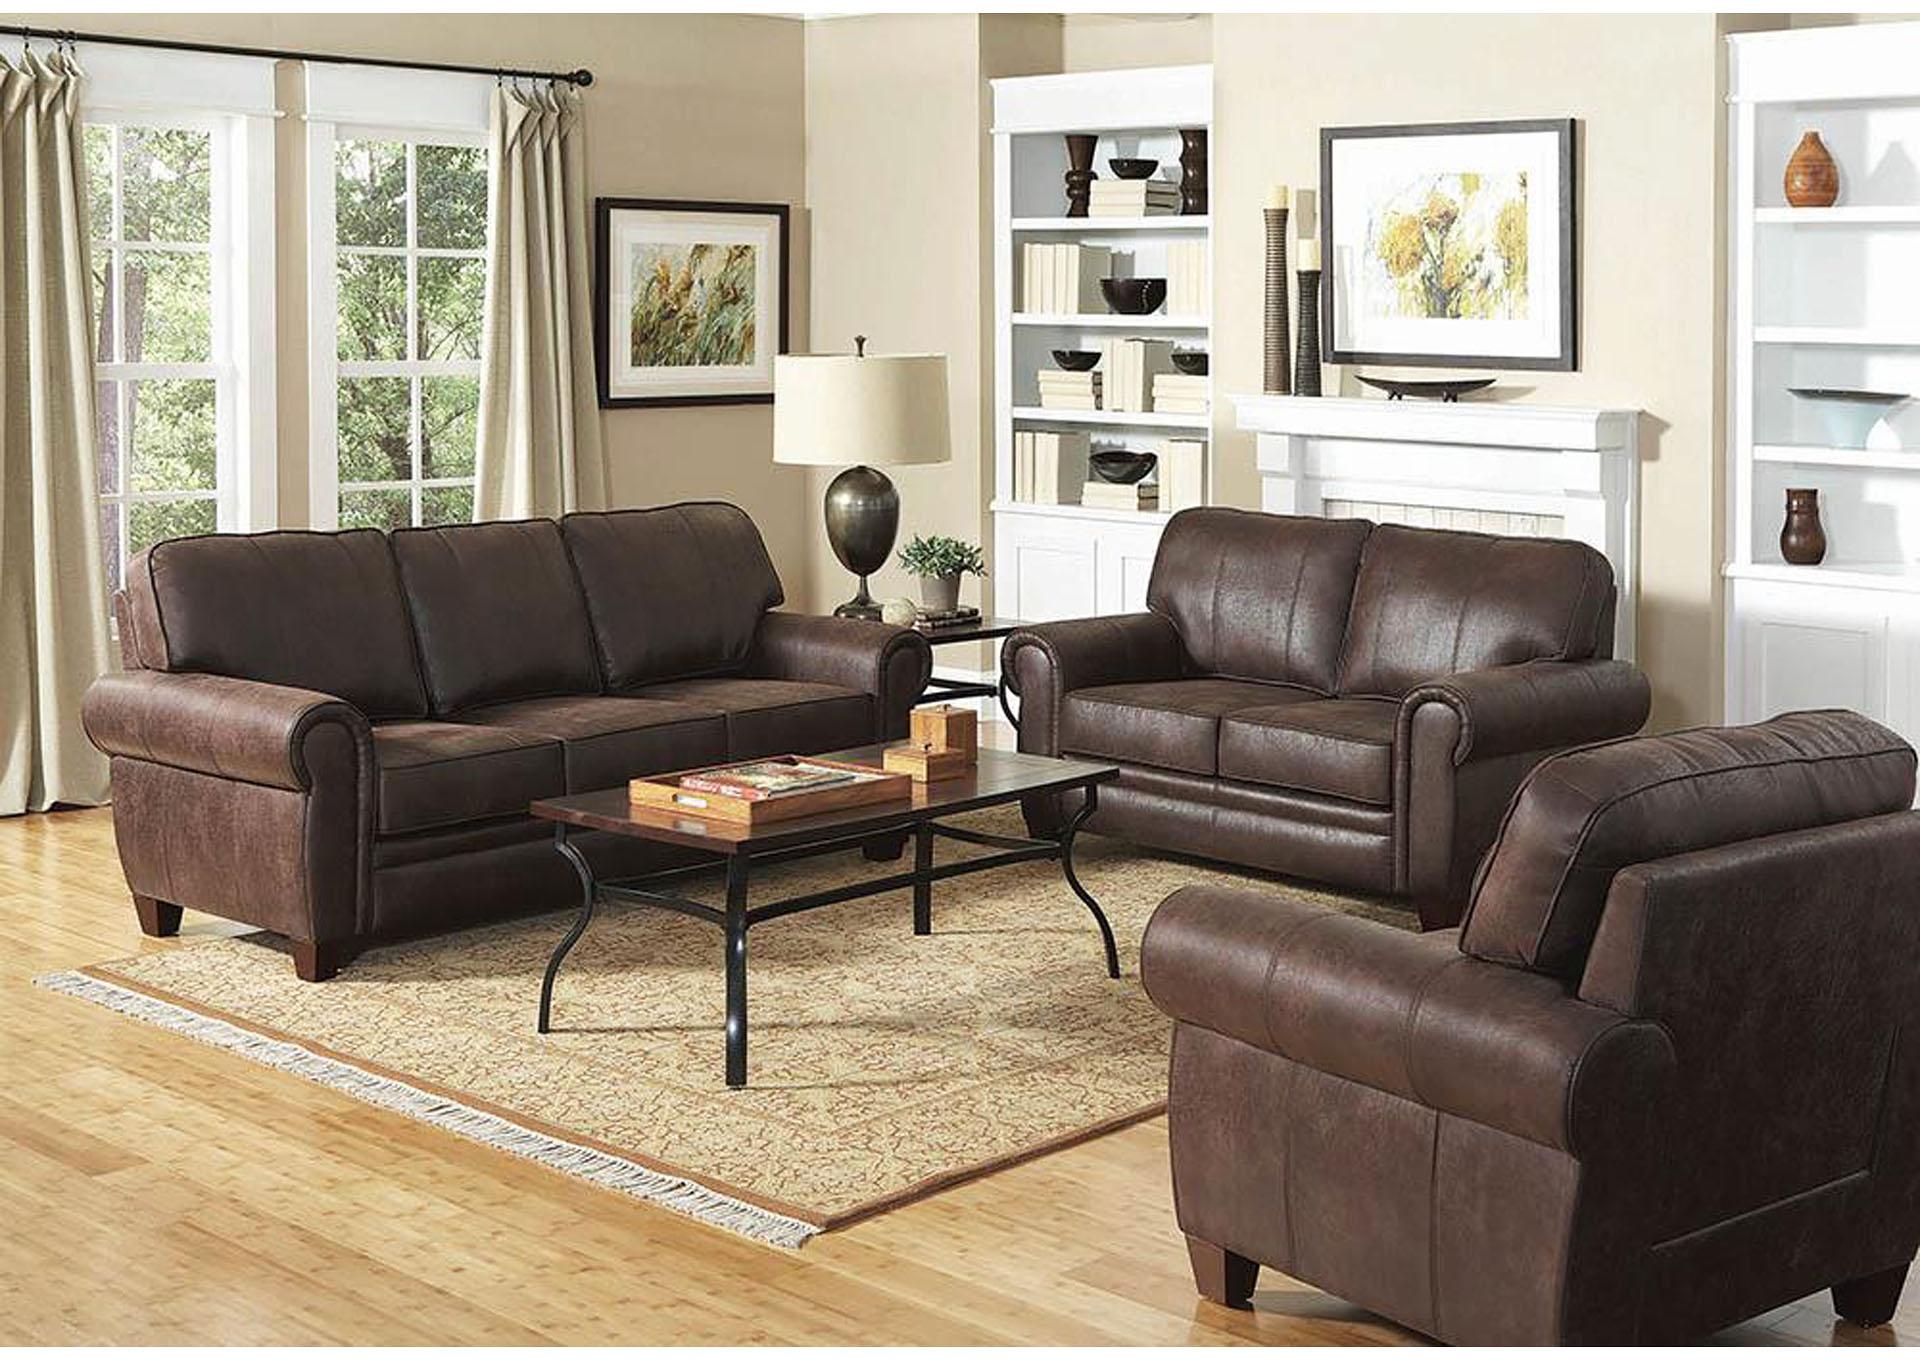 Bentley Brown Love Seat,Coaster Furniture